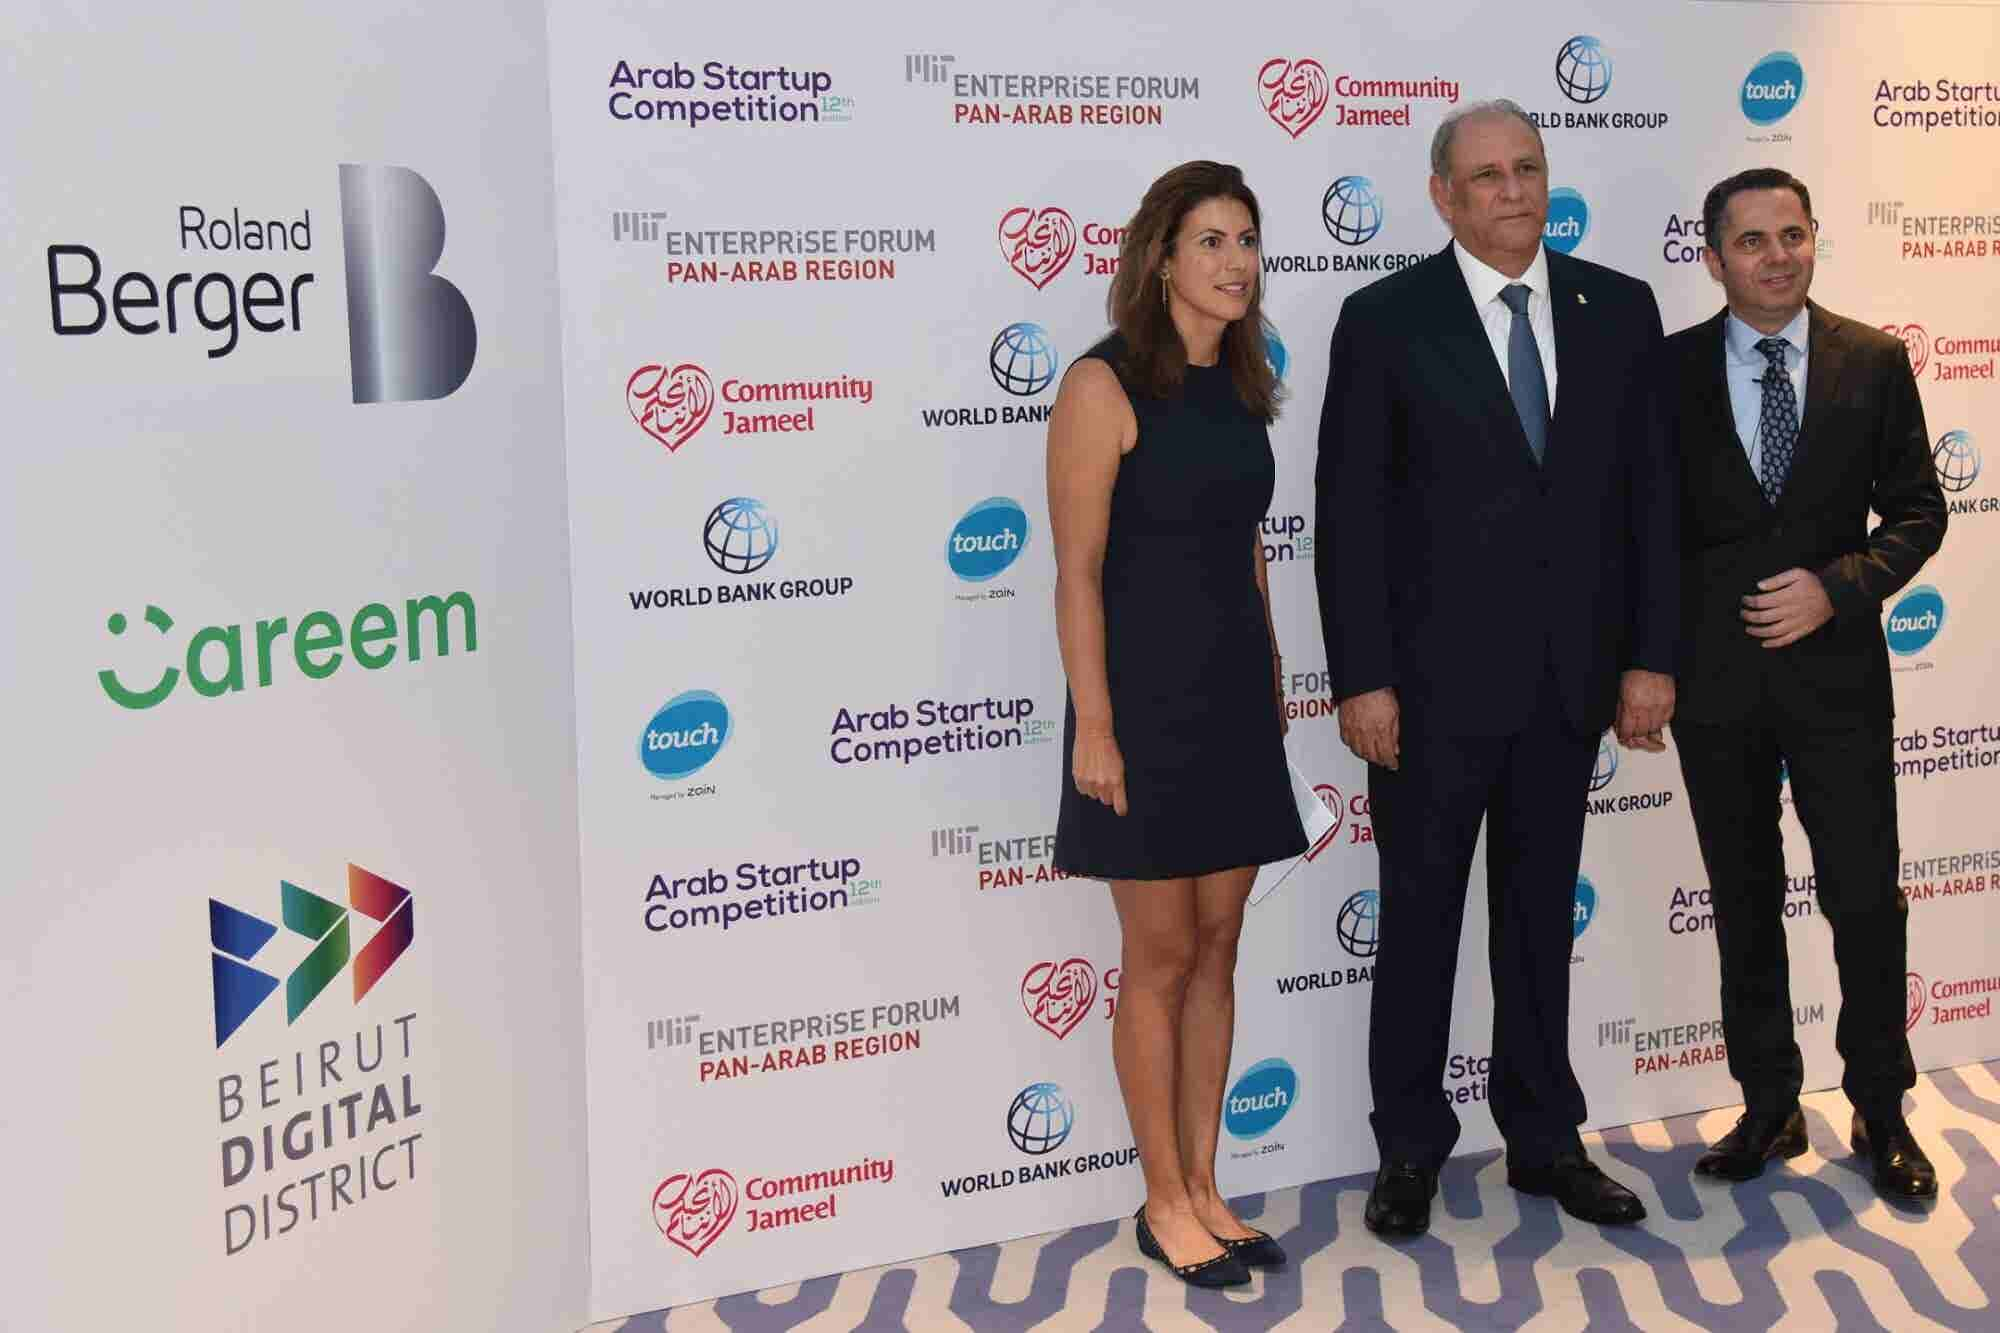 MIT Enterprise Forum Pan Arab Invites Applications for Its 12th Arab S...